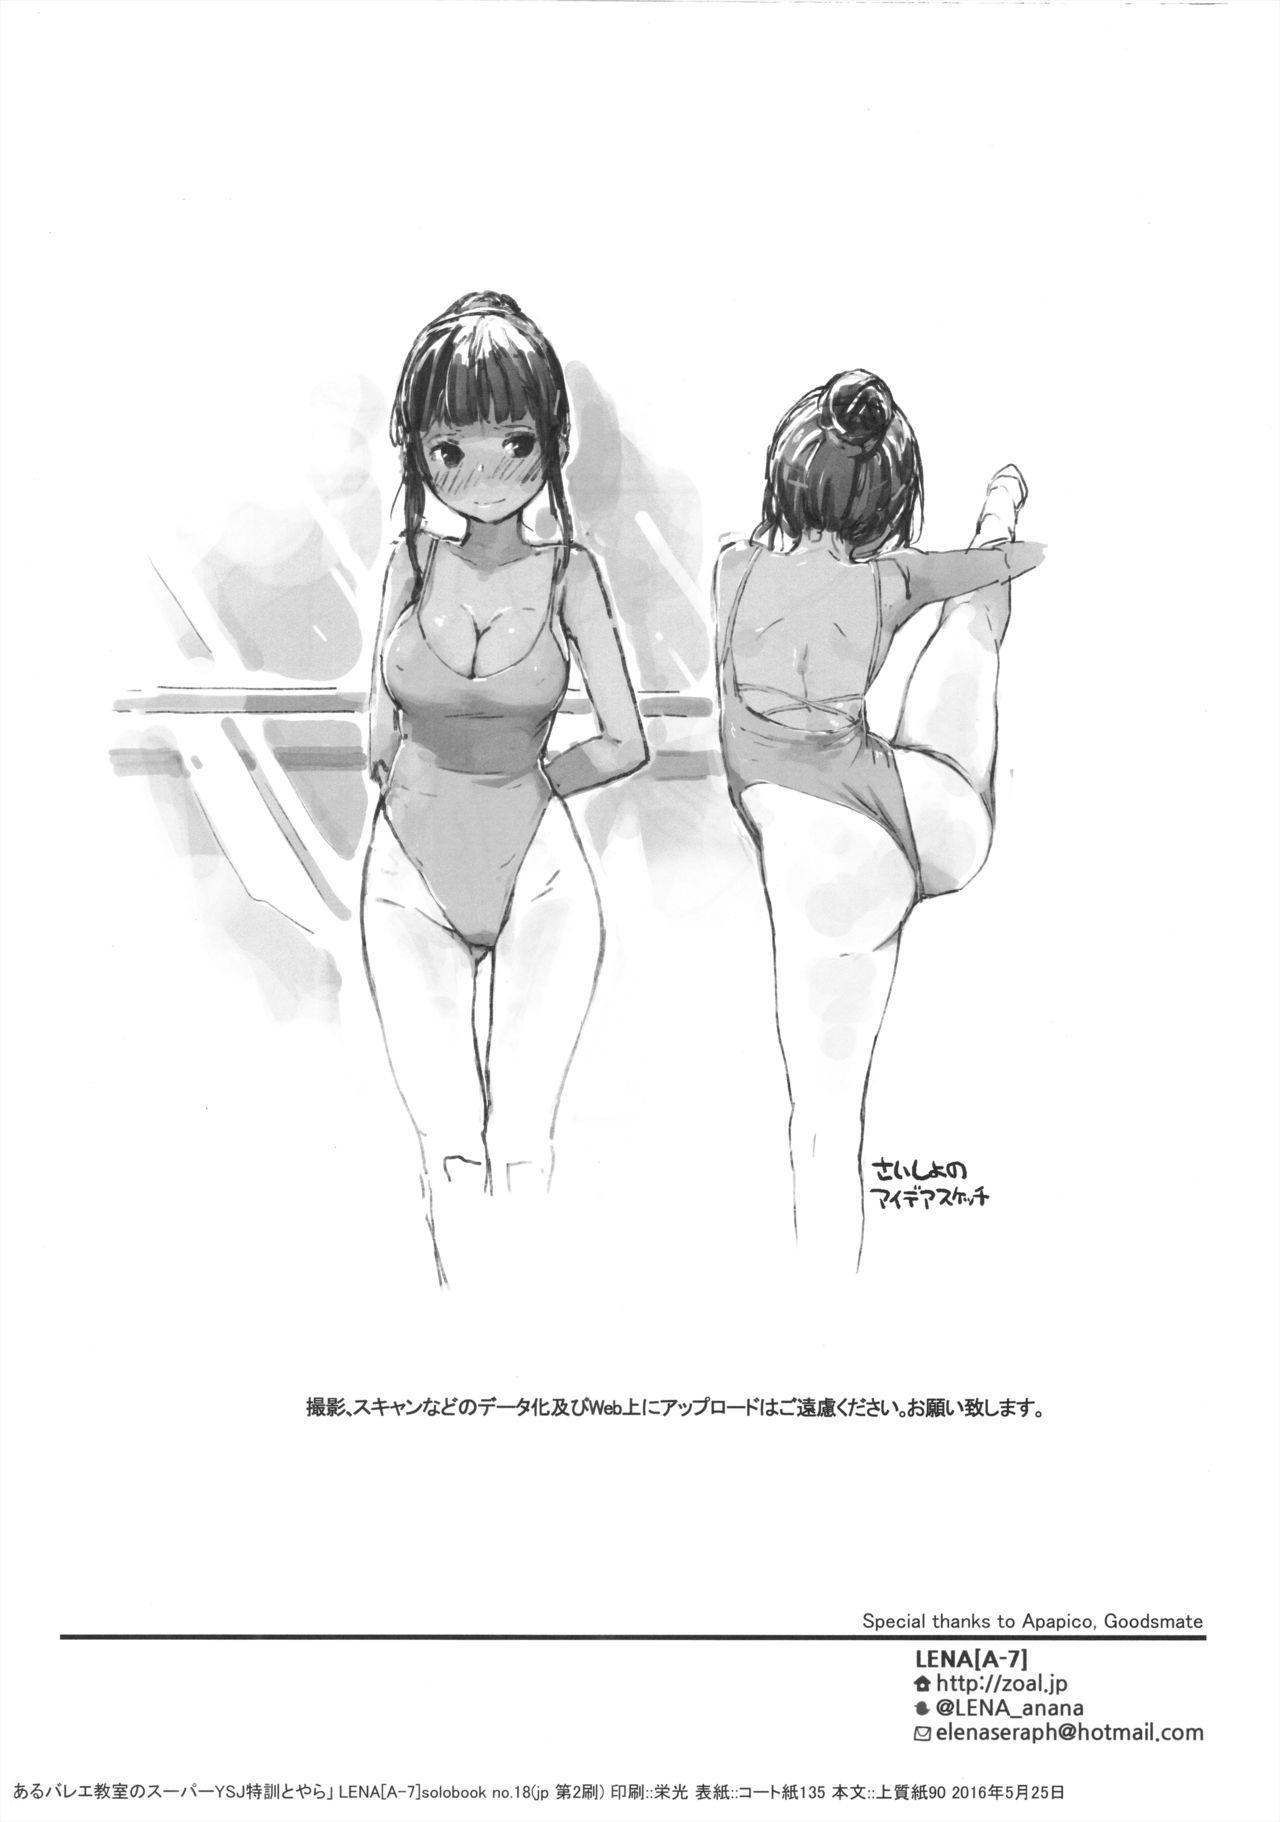 )] aru ballet kyoushitsu no super YSJ tokkun to yara | It's the ballet class's super YSJ training 11